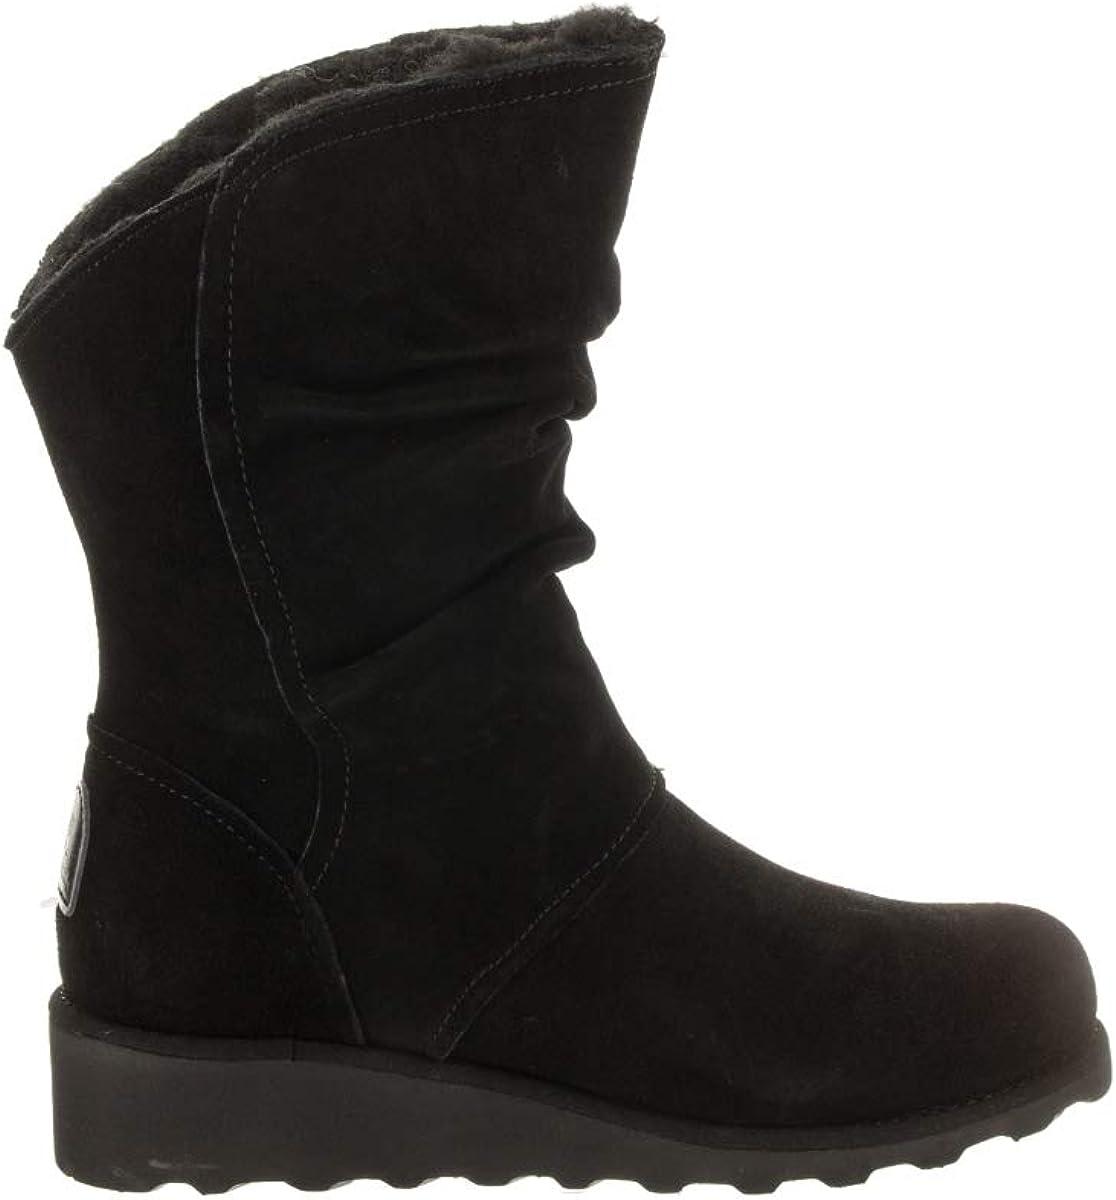 Bearpaw Womens Dana Fashion Boot